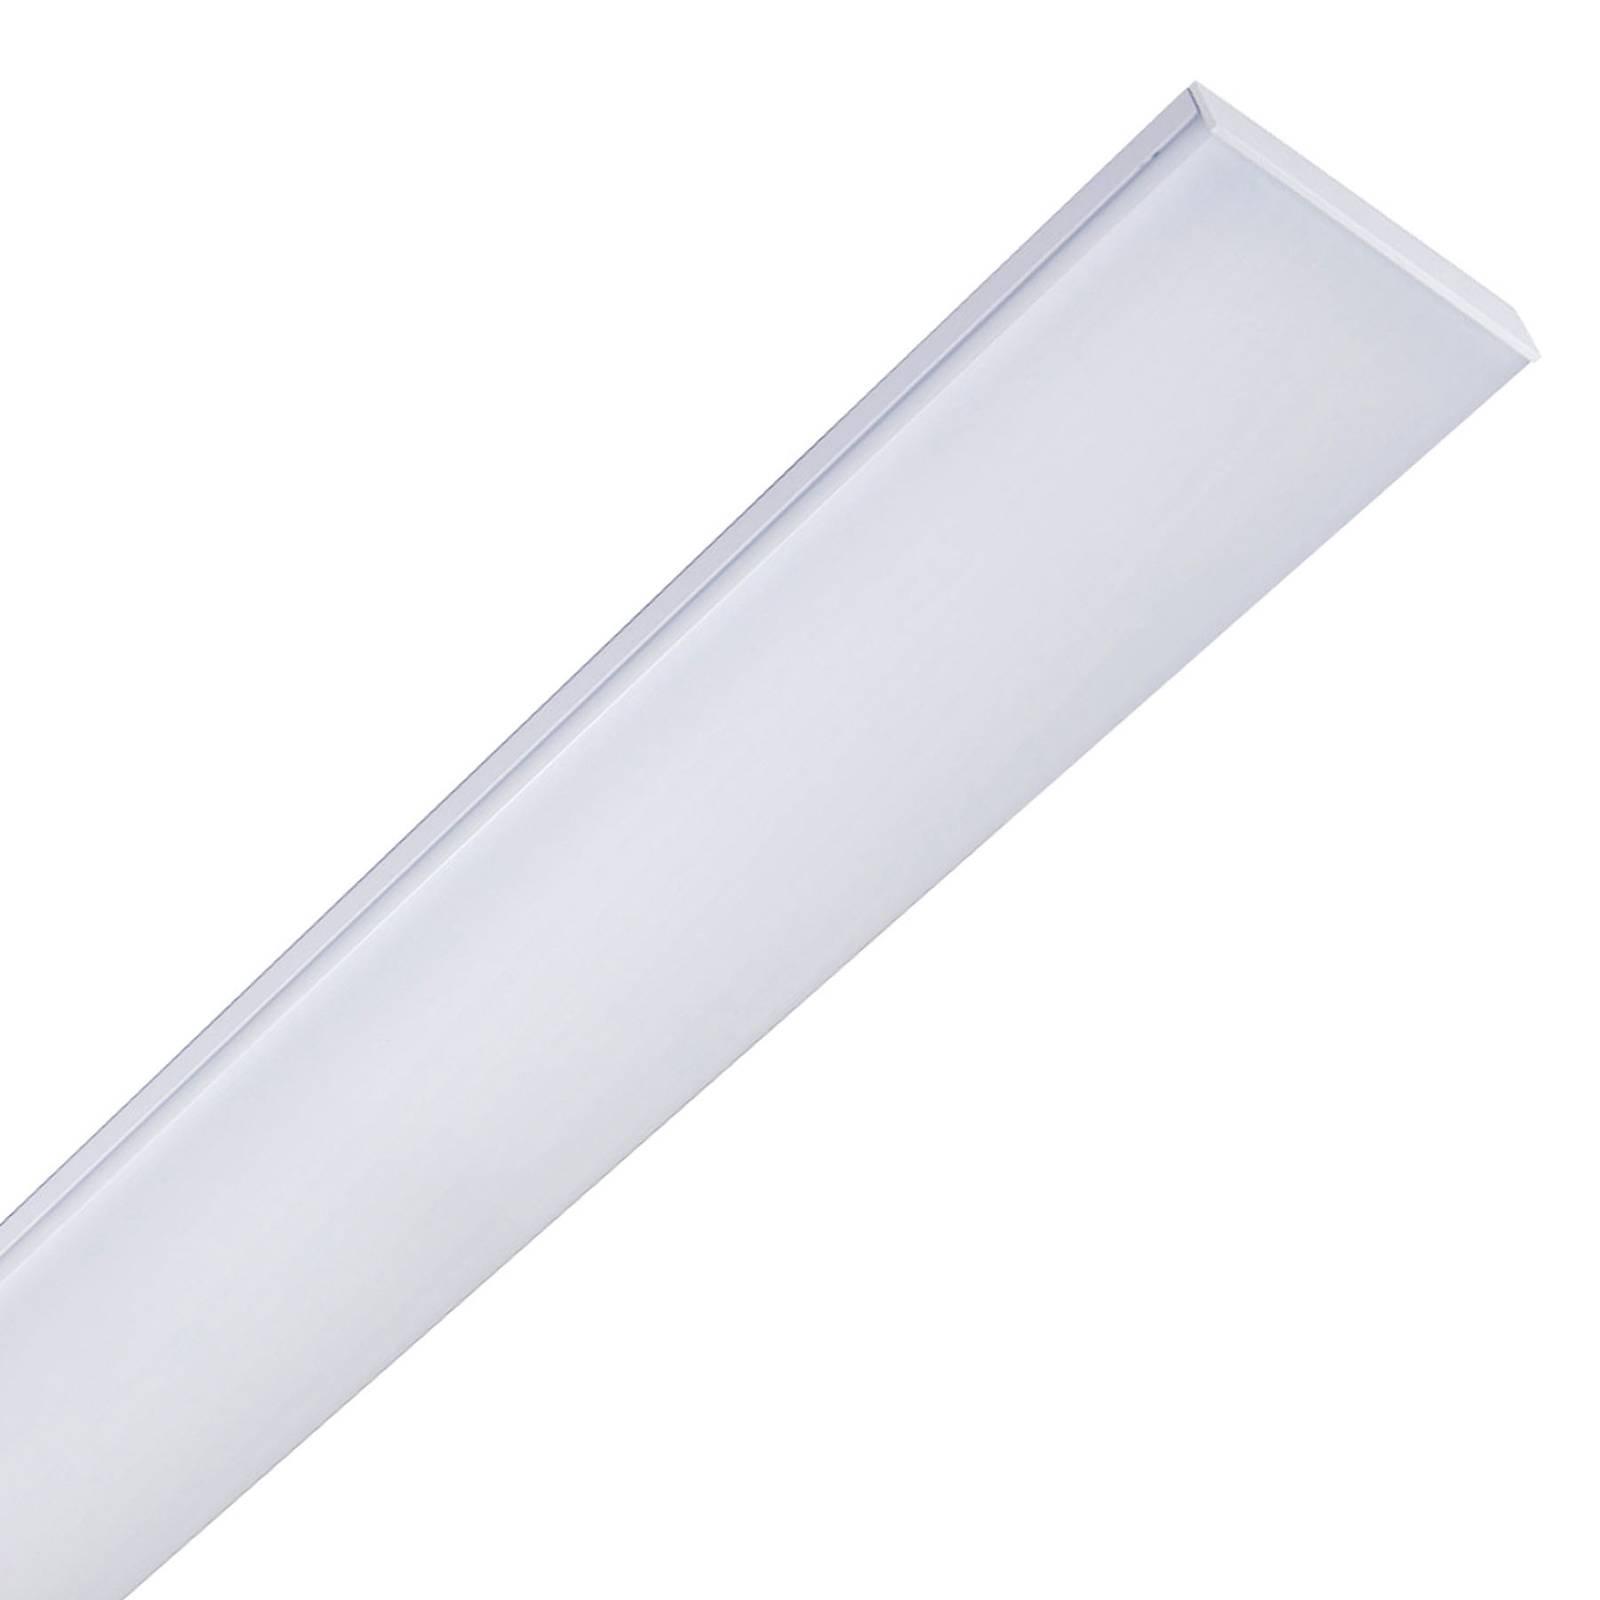 Müller Licht Planus 90 -LED-kattovalaisin